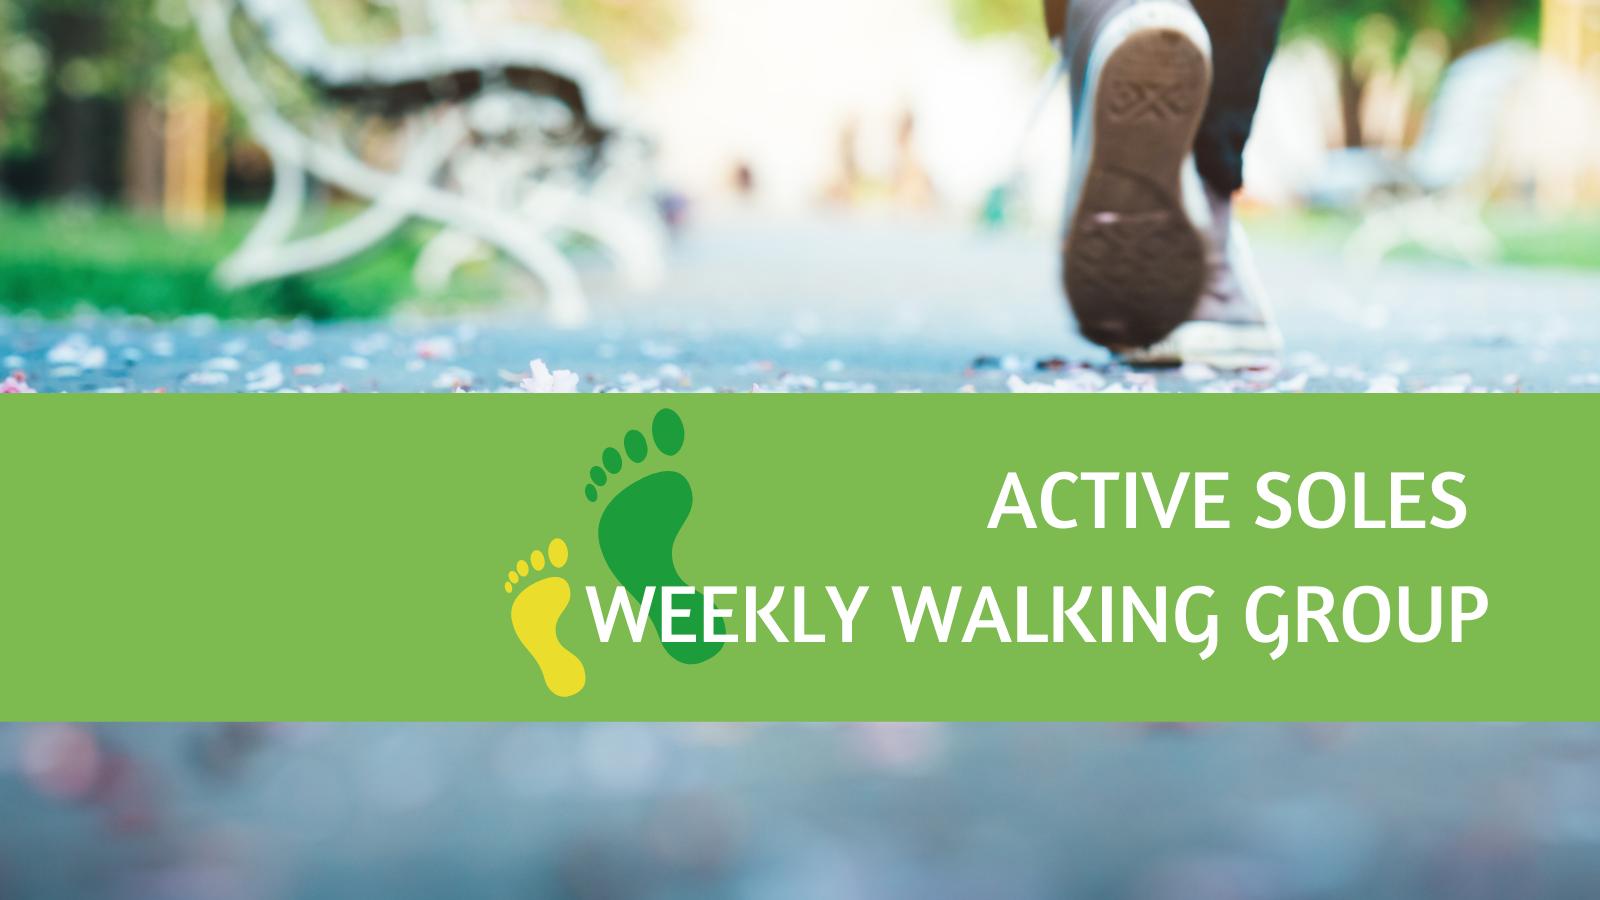 ACTIVE SOLES WEEKLY WALKING GROUP (NEW) - TW - Website (no logo)